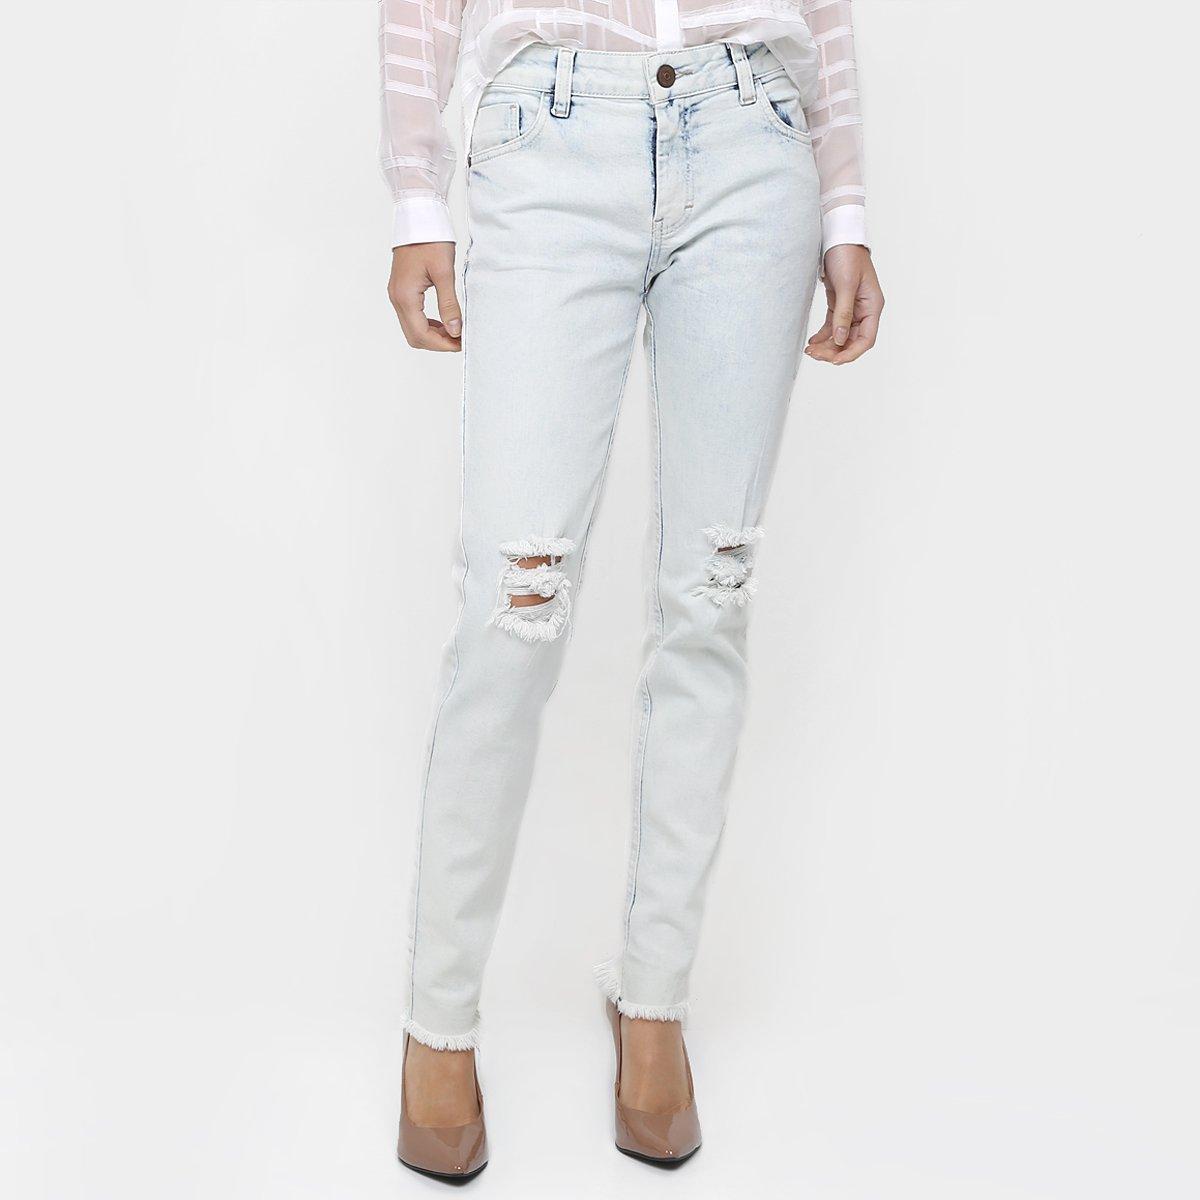 c648e4add Calça Jeans M. Officer Skinny Rasgada - Compre Agora | Zattini